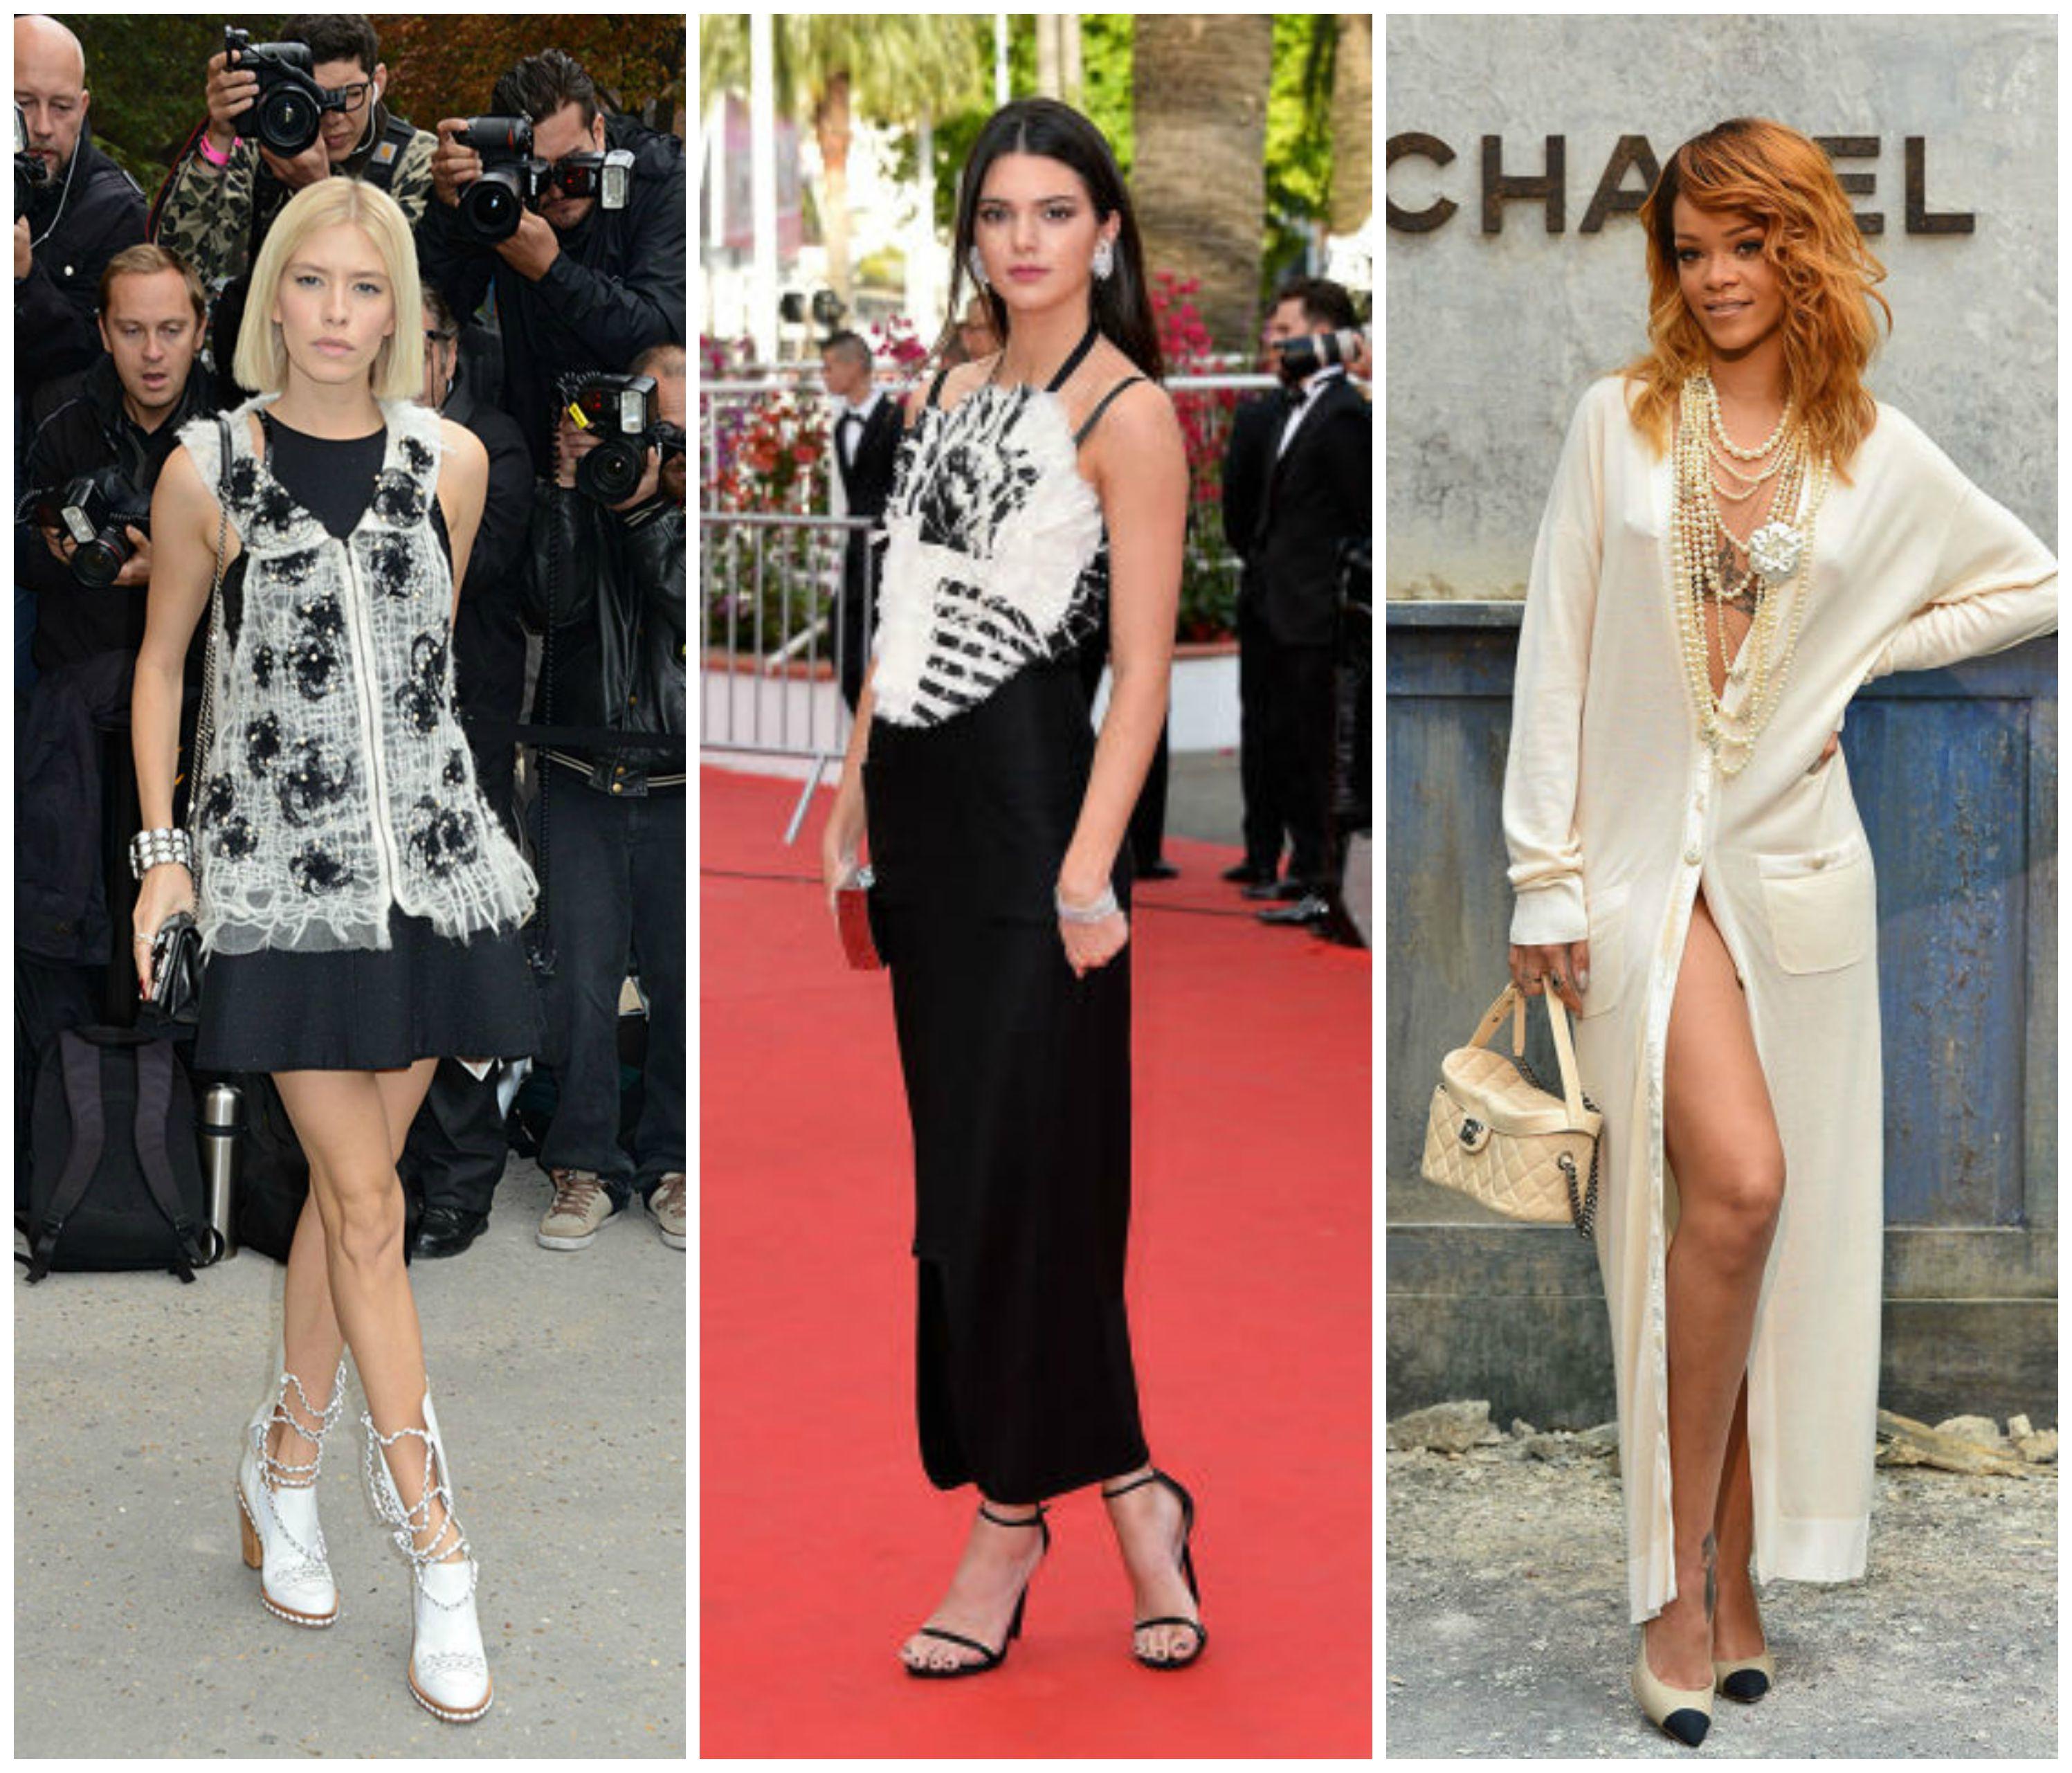 Звезды в нарядах Chanel